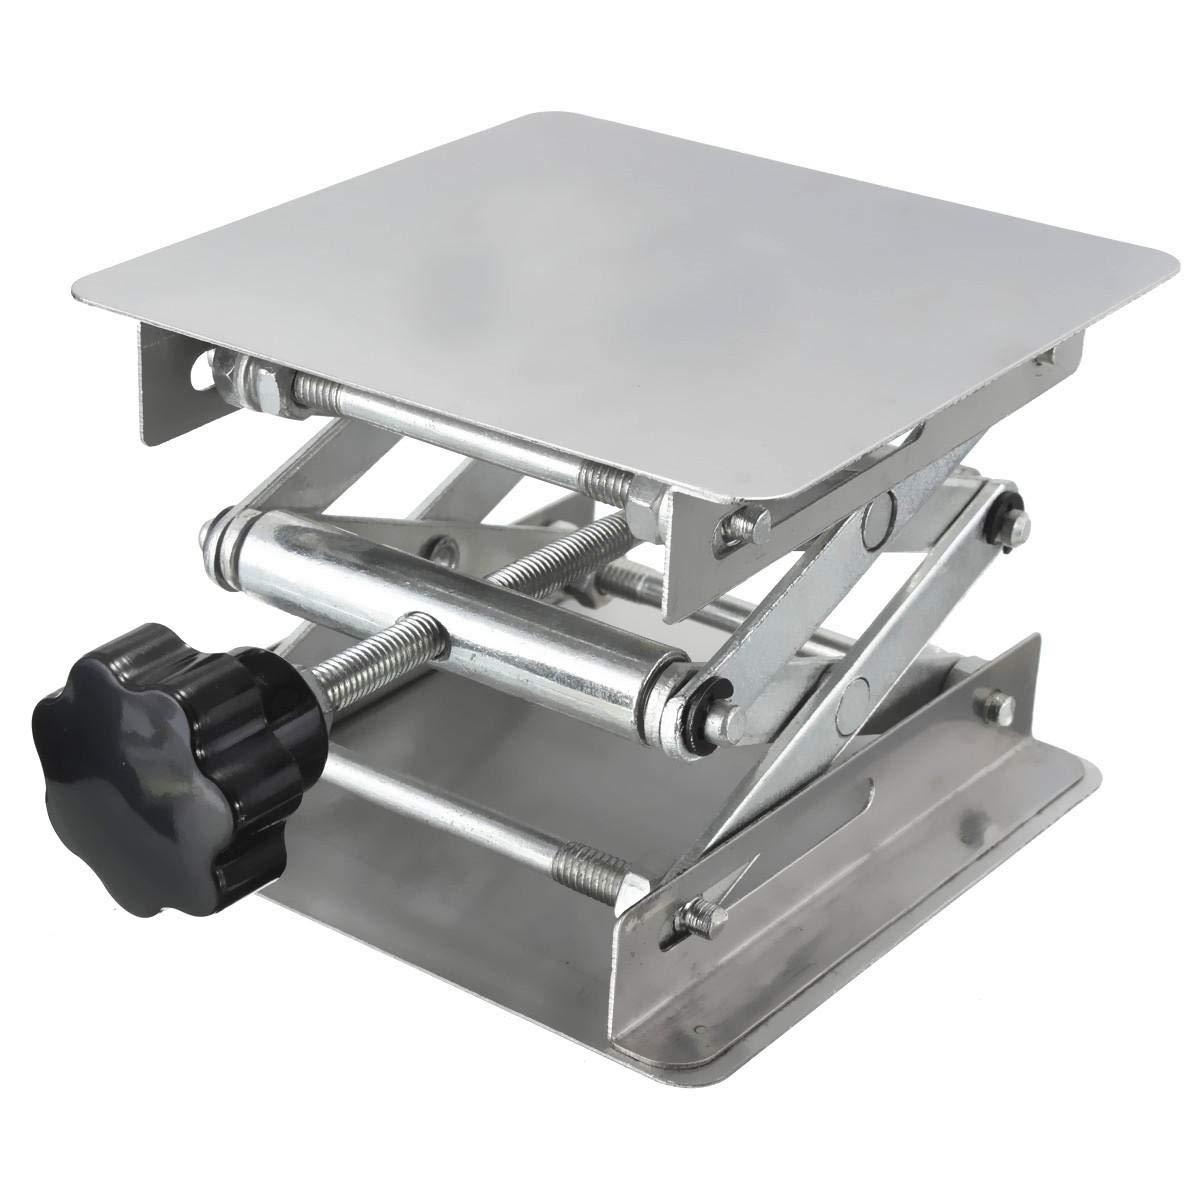 4 x 4'' Stainless Steel Lifting Platform Lab Stand Laboratory Manual Lift Riser Lifter 100x100x150mm